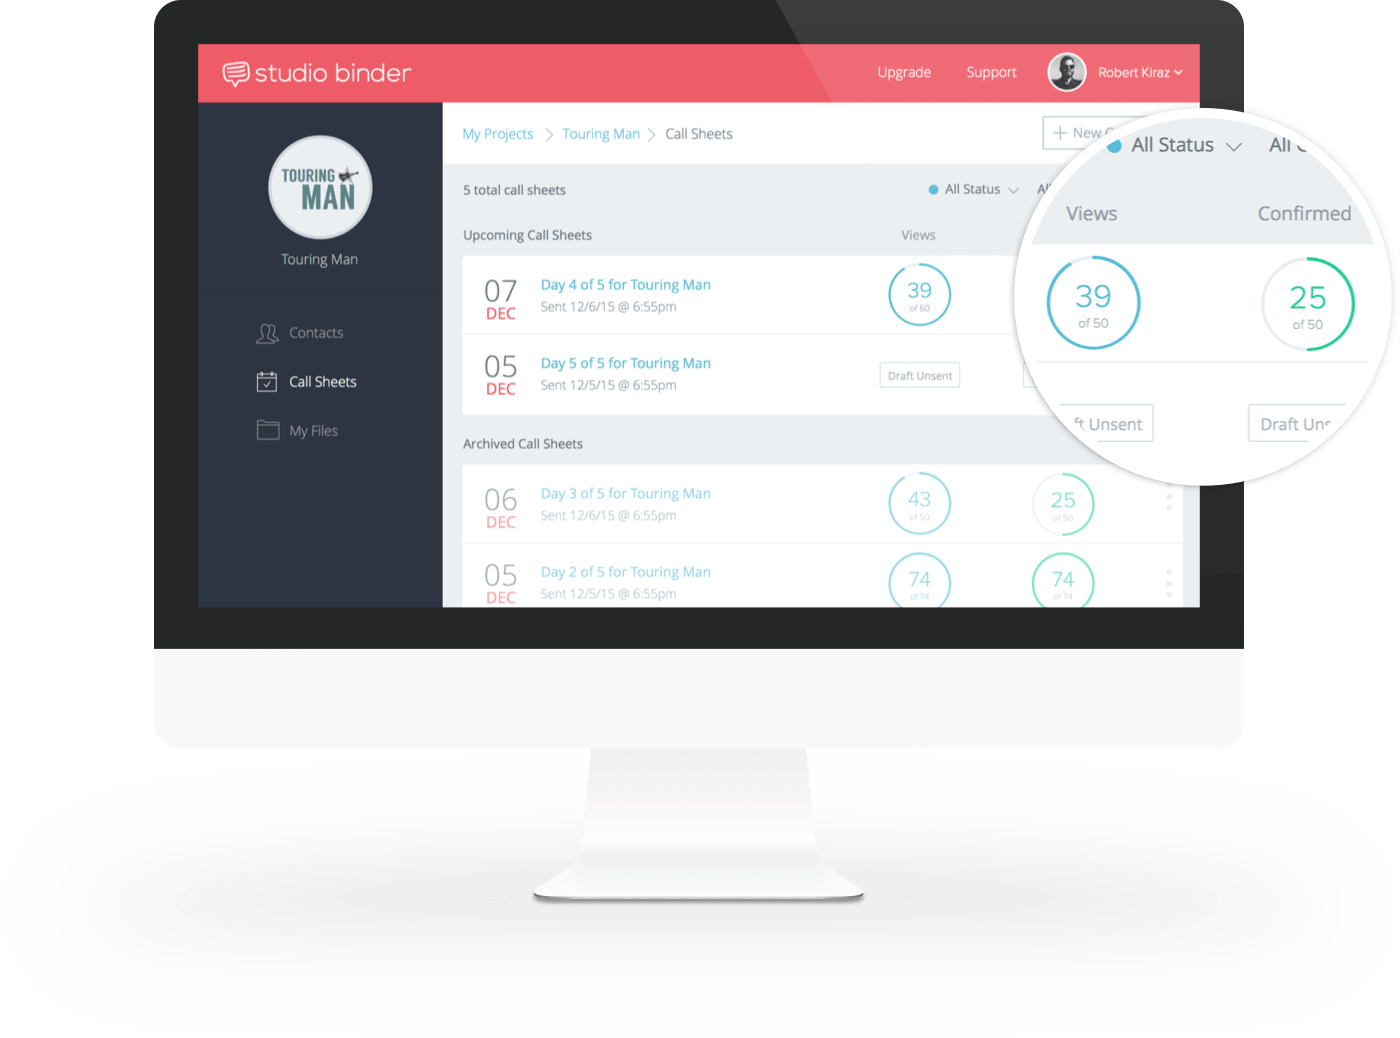 StudioBinder Call Sheet App – Track Call Sheet Confirmations